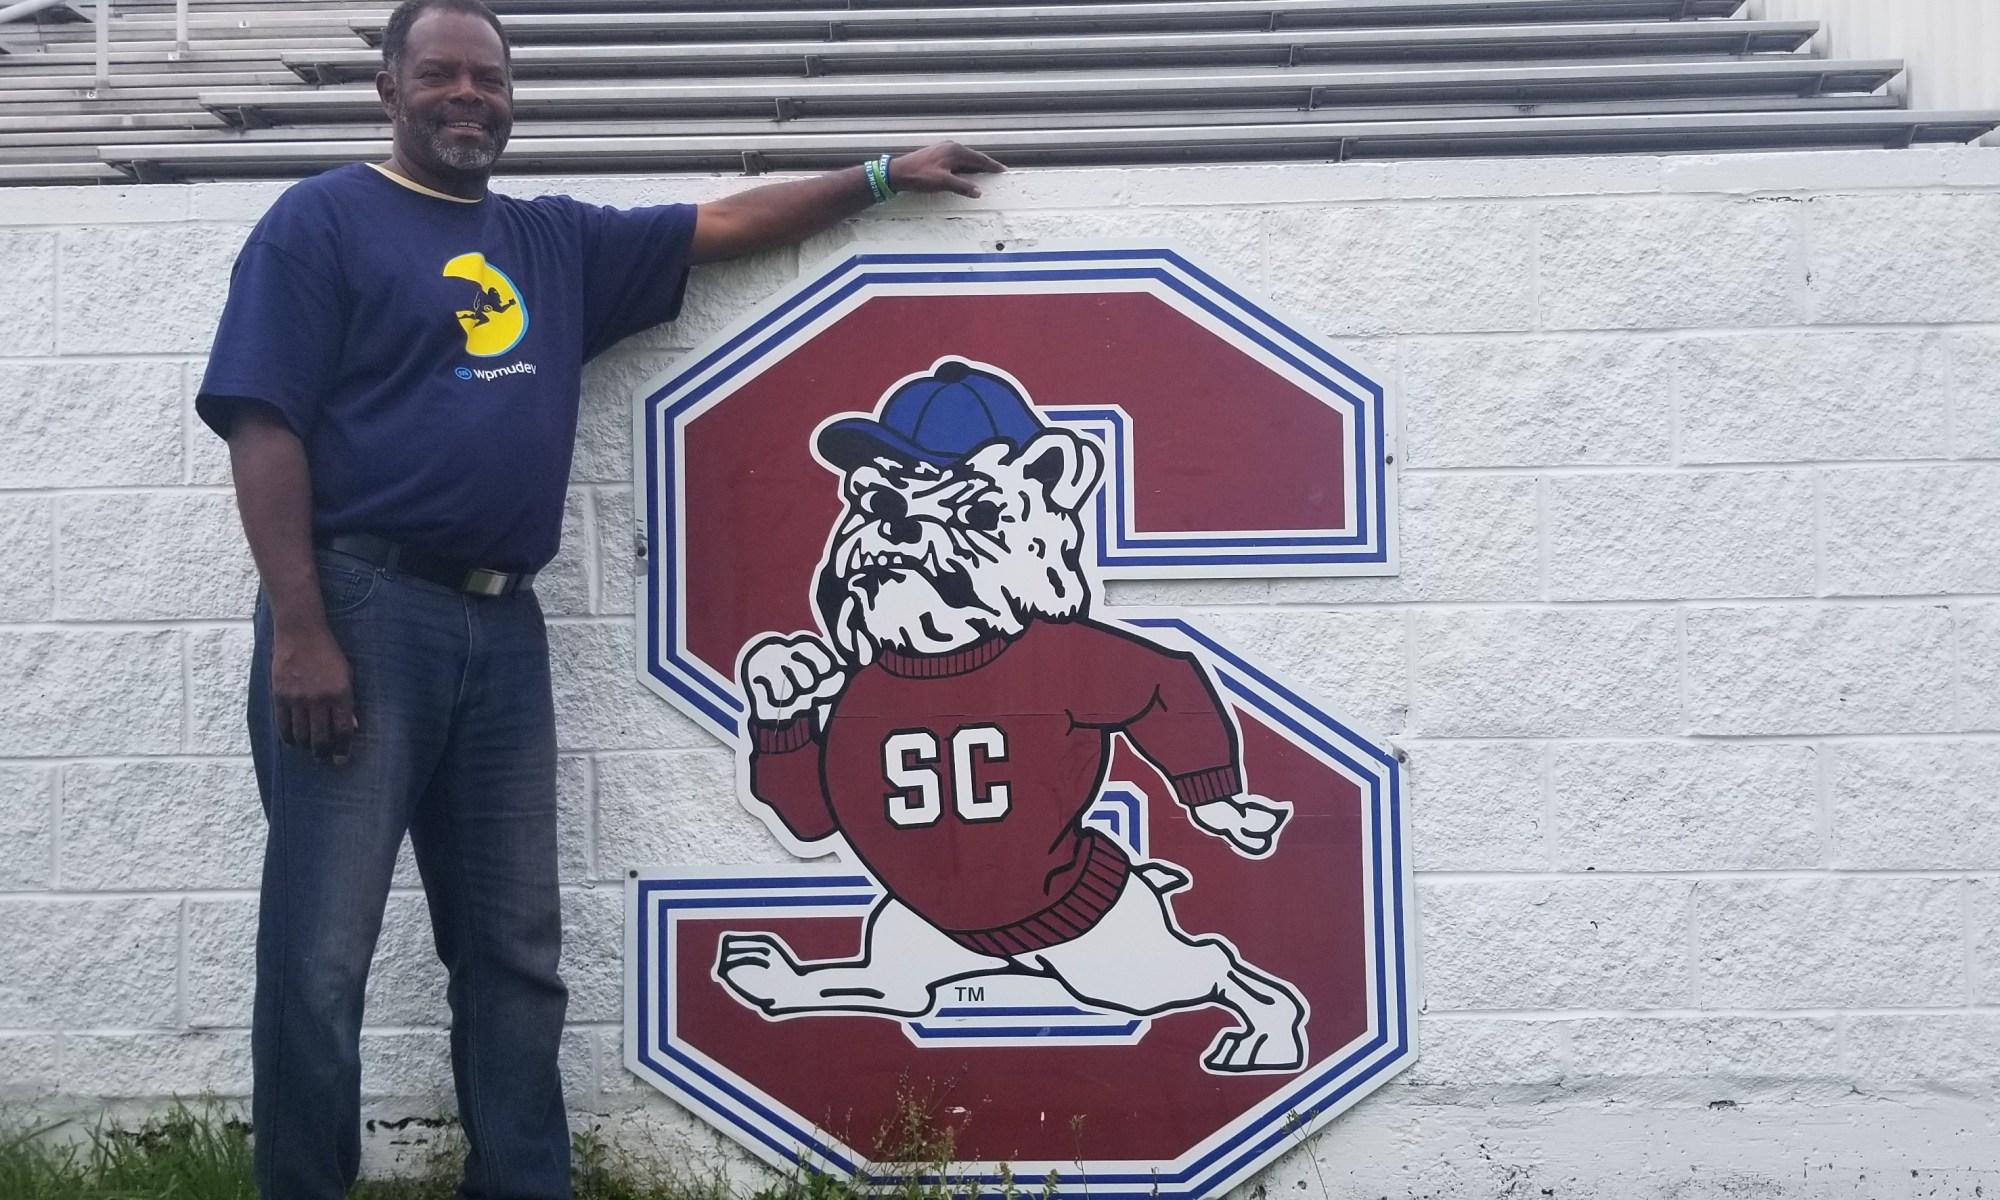 Wm Jackson SCSU Grad